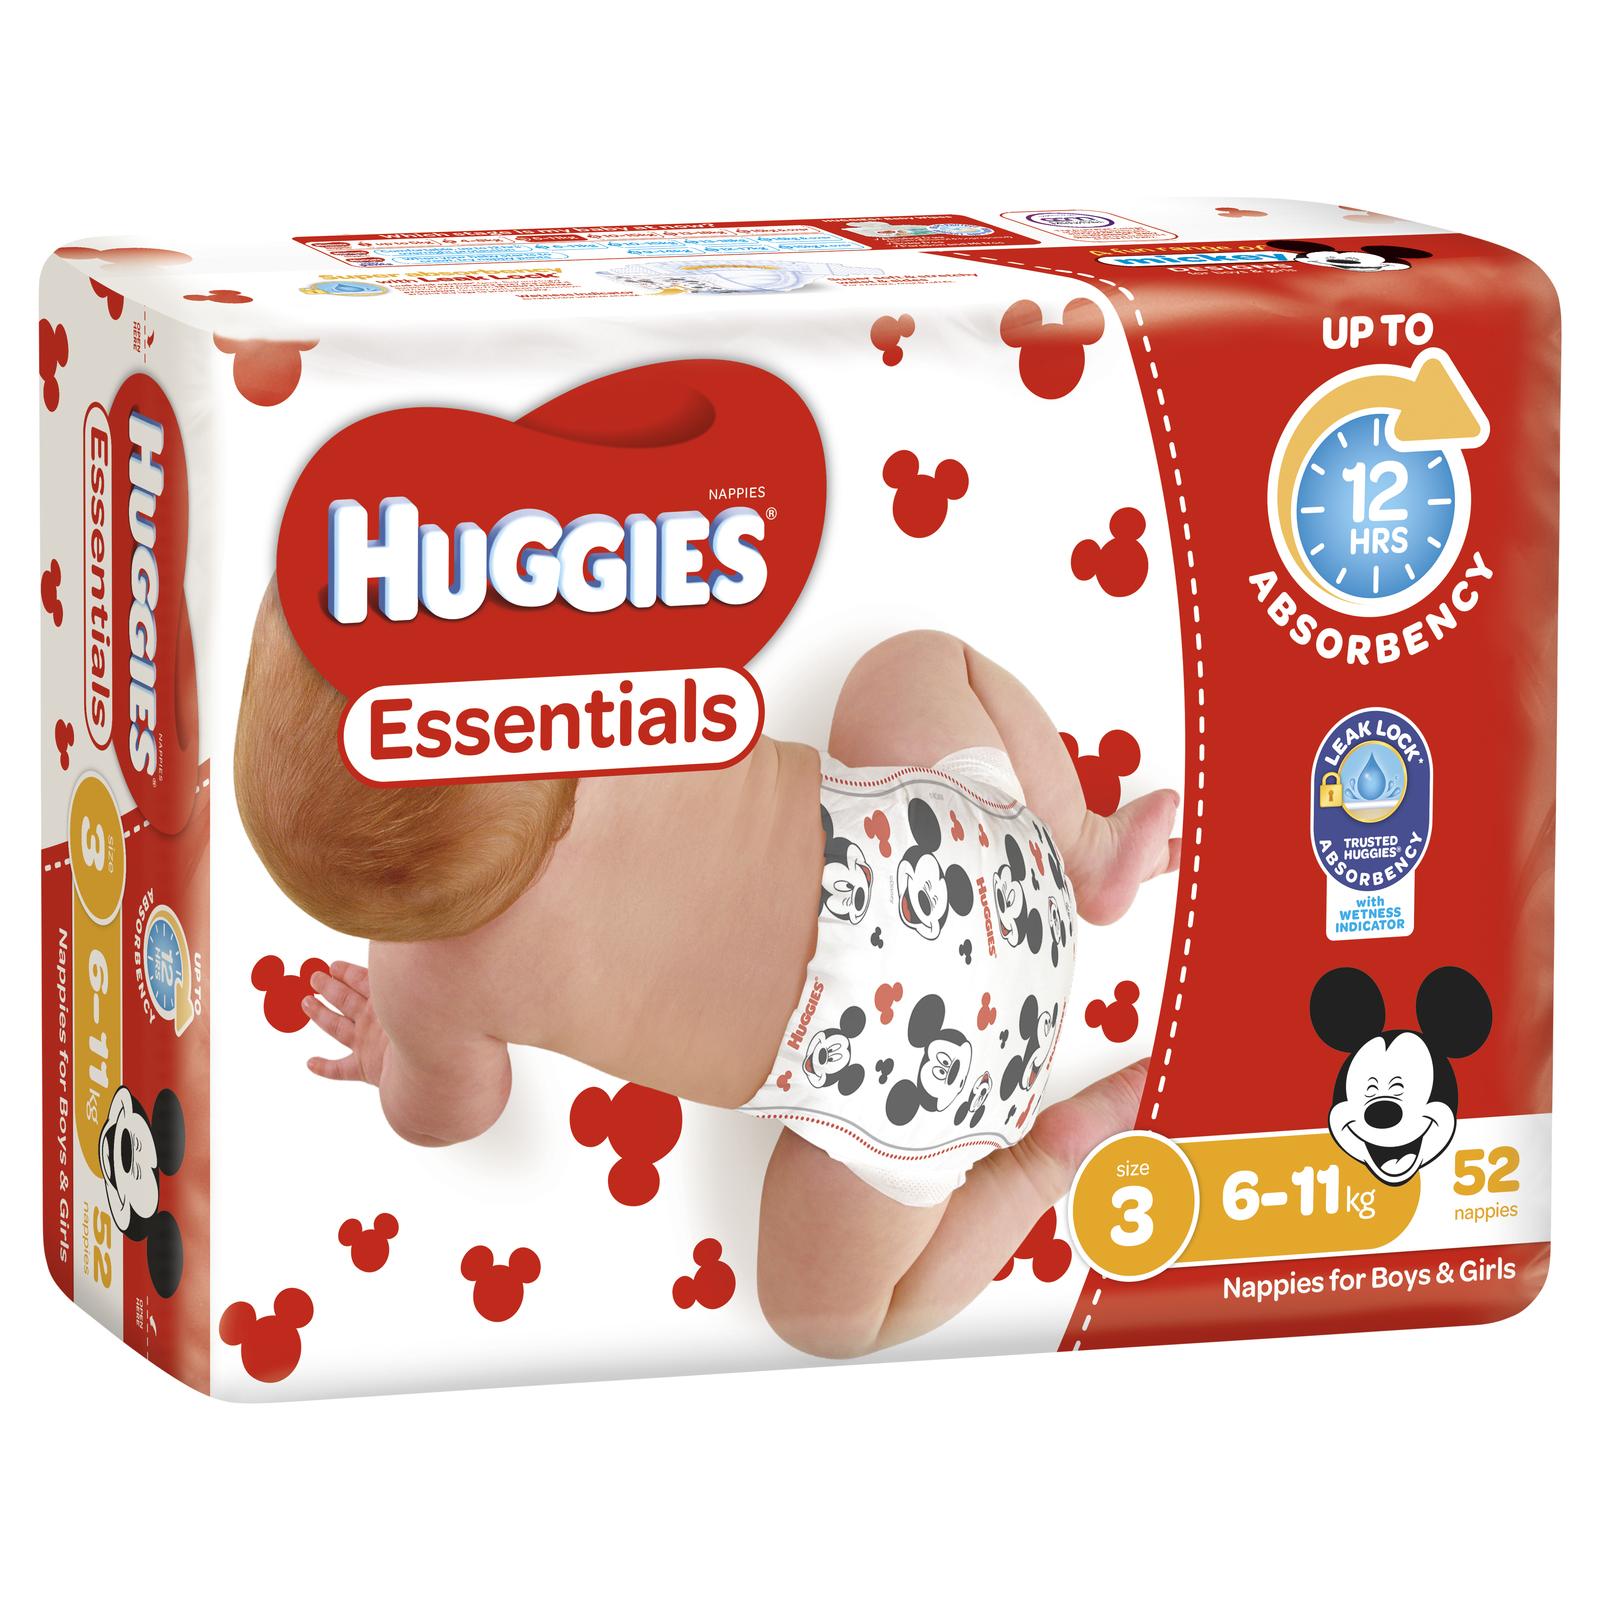 Huggies Essentials Nappies Bulk - Size 3 Crawler (52) image